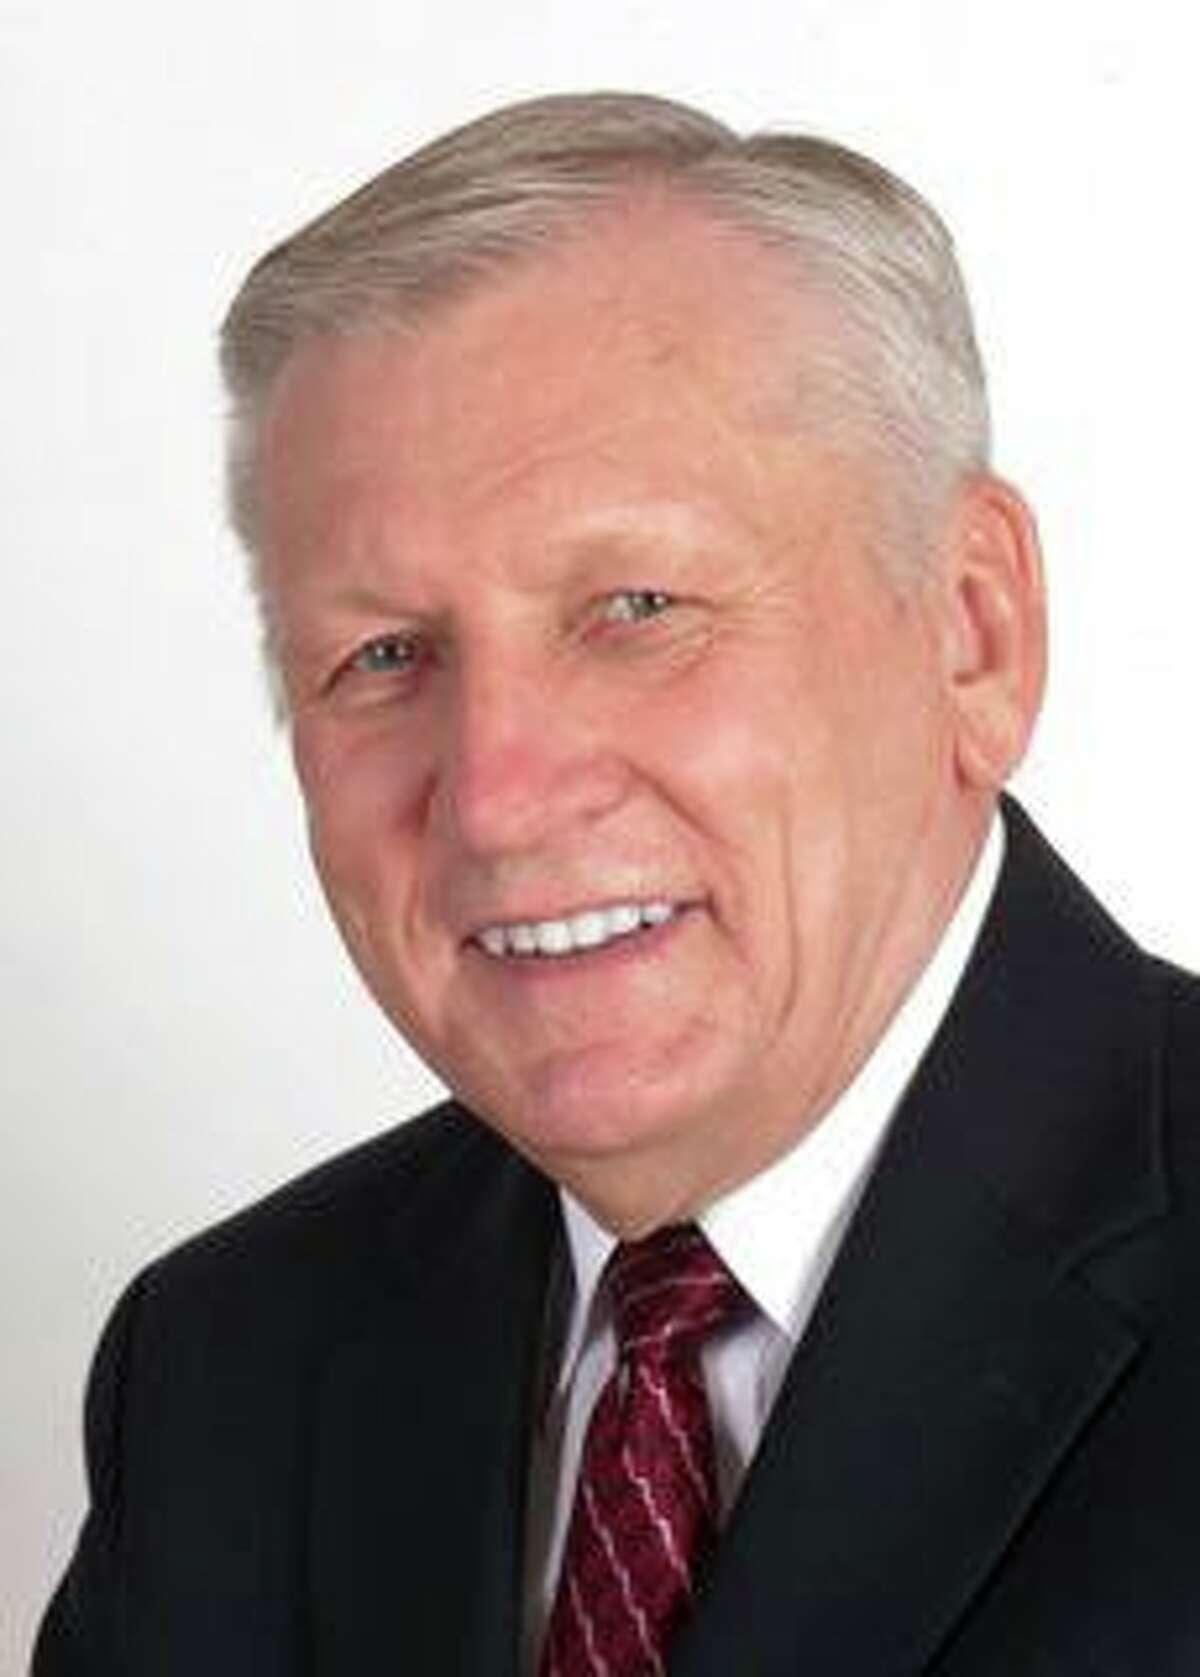 Bethel Republican Selectman Paul Szatkowski